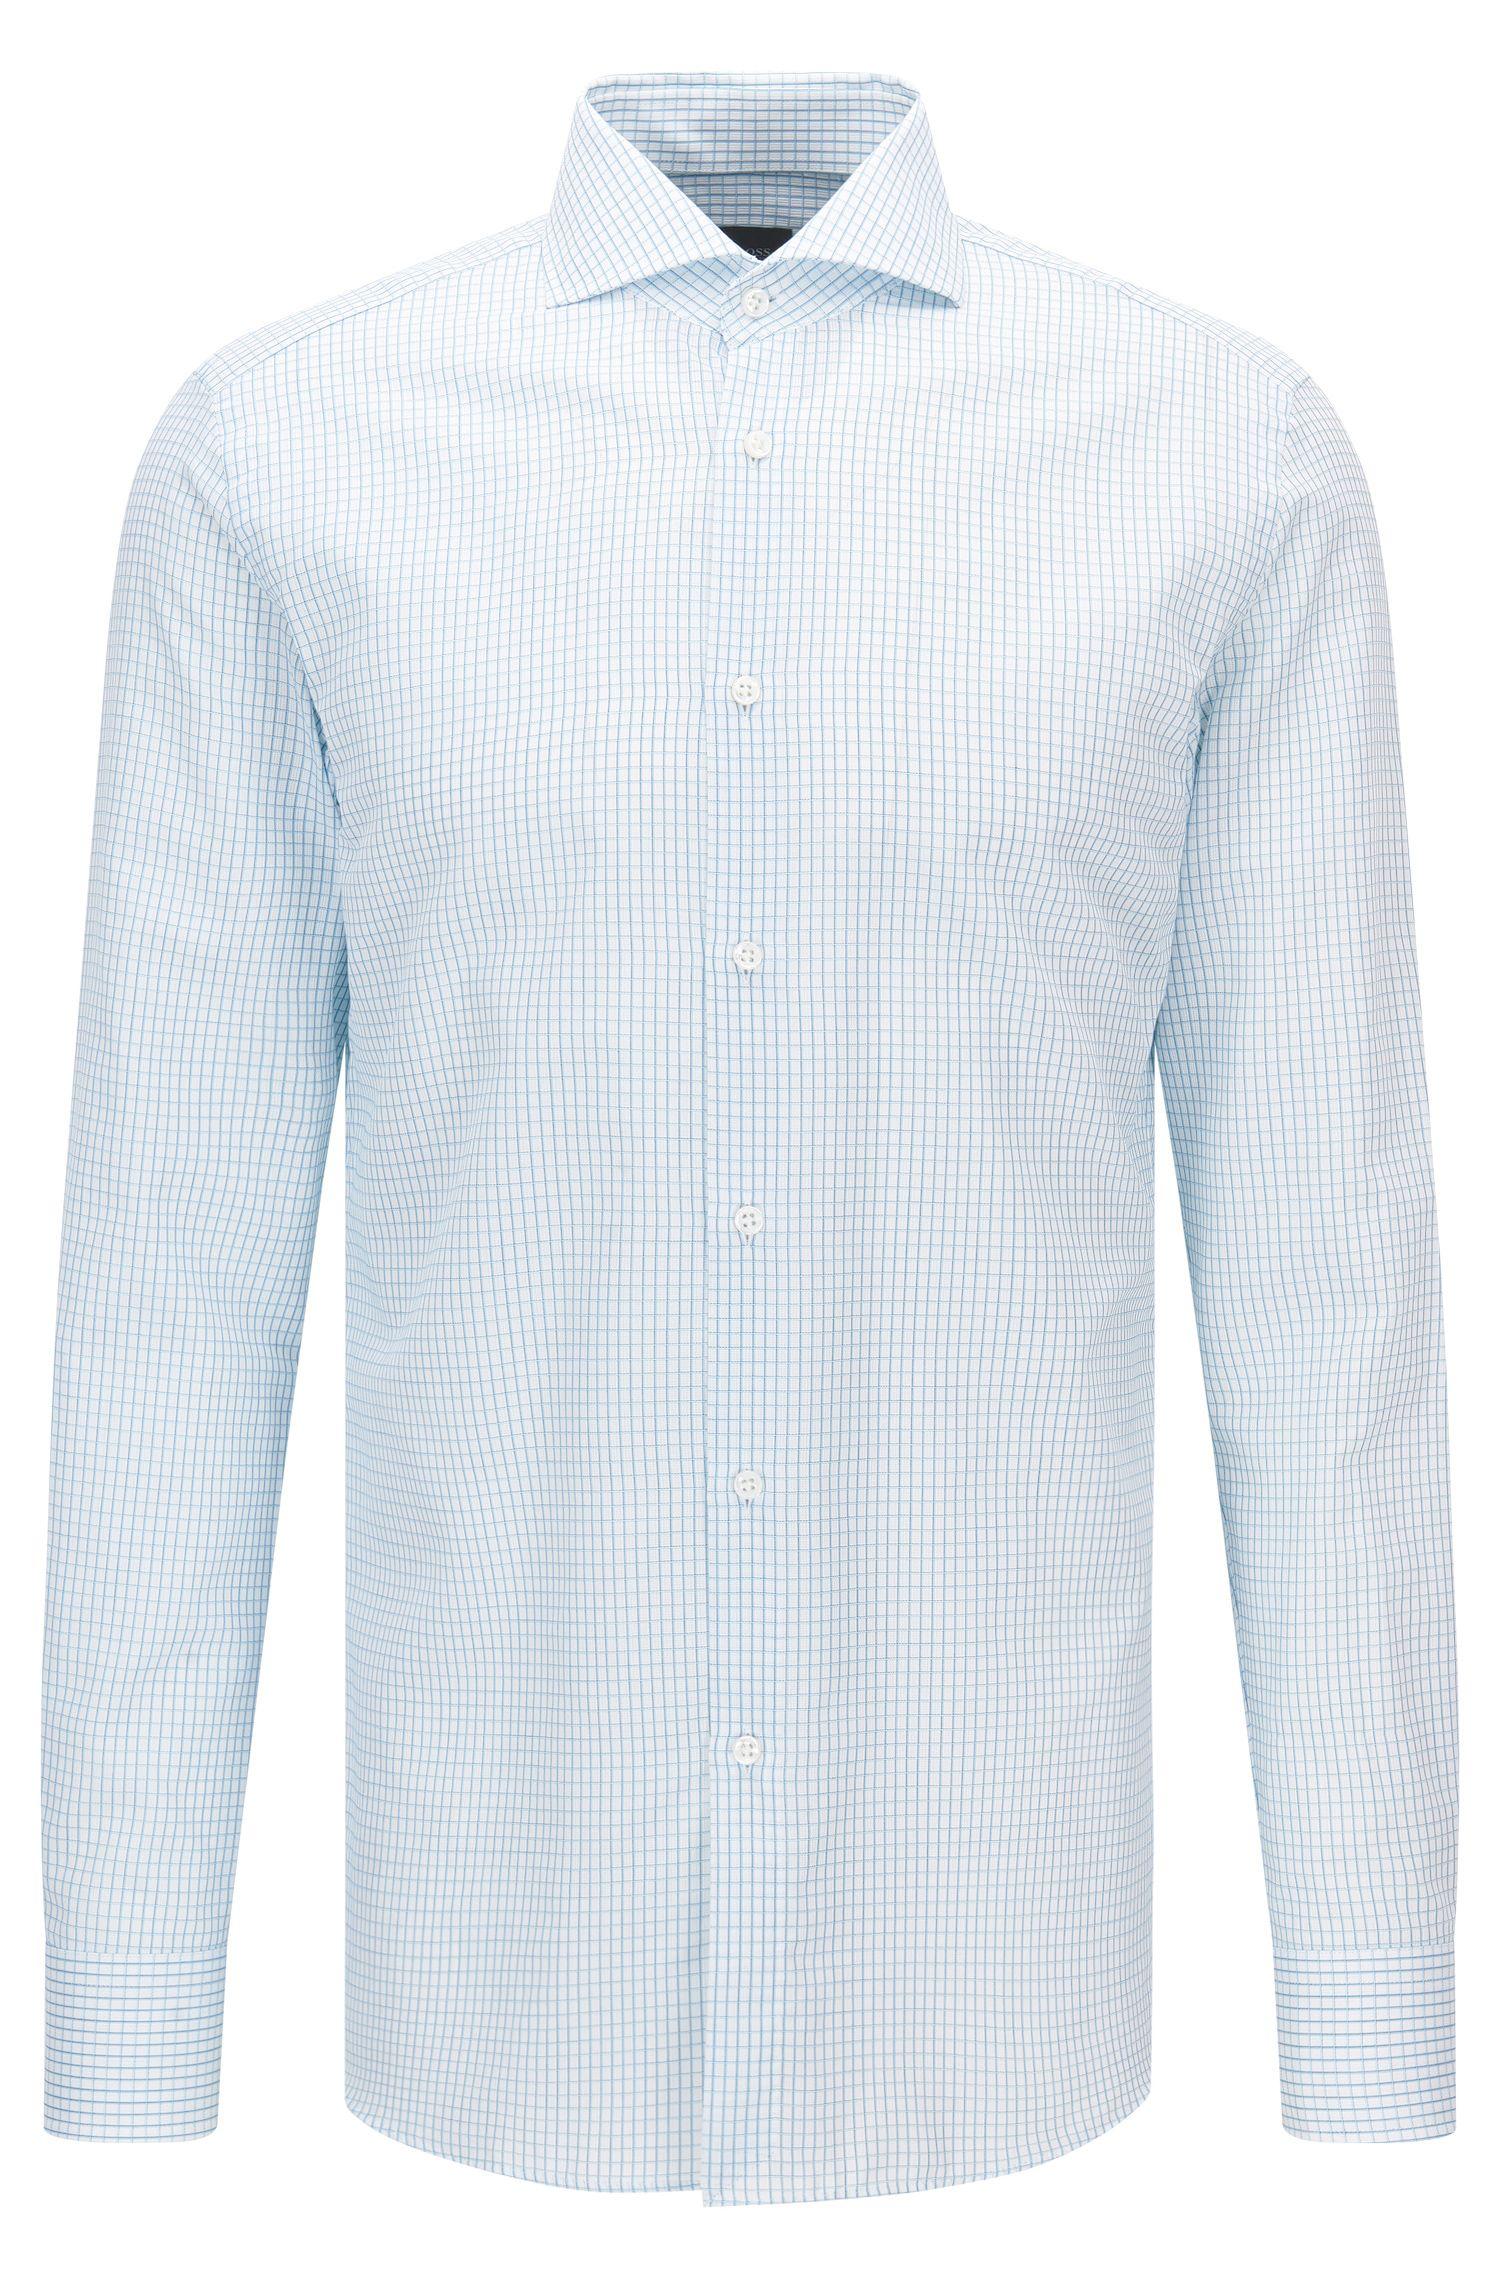 Check Italian Cotton Dress Shirt, Slim Fit | T-Christo